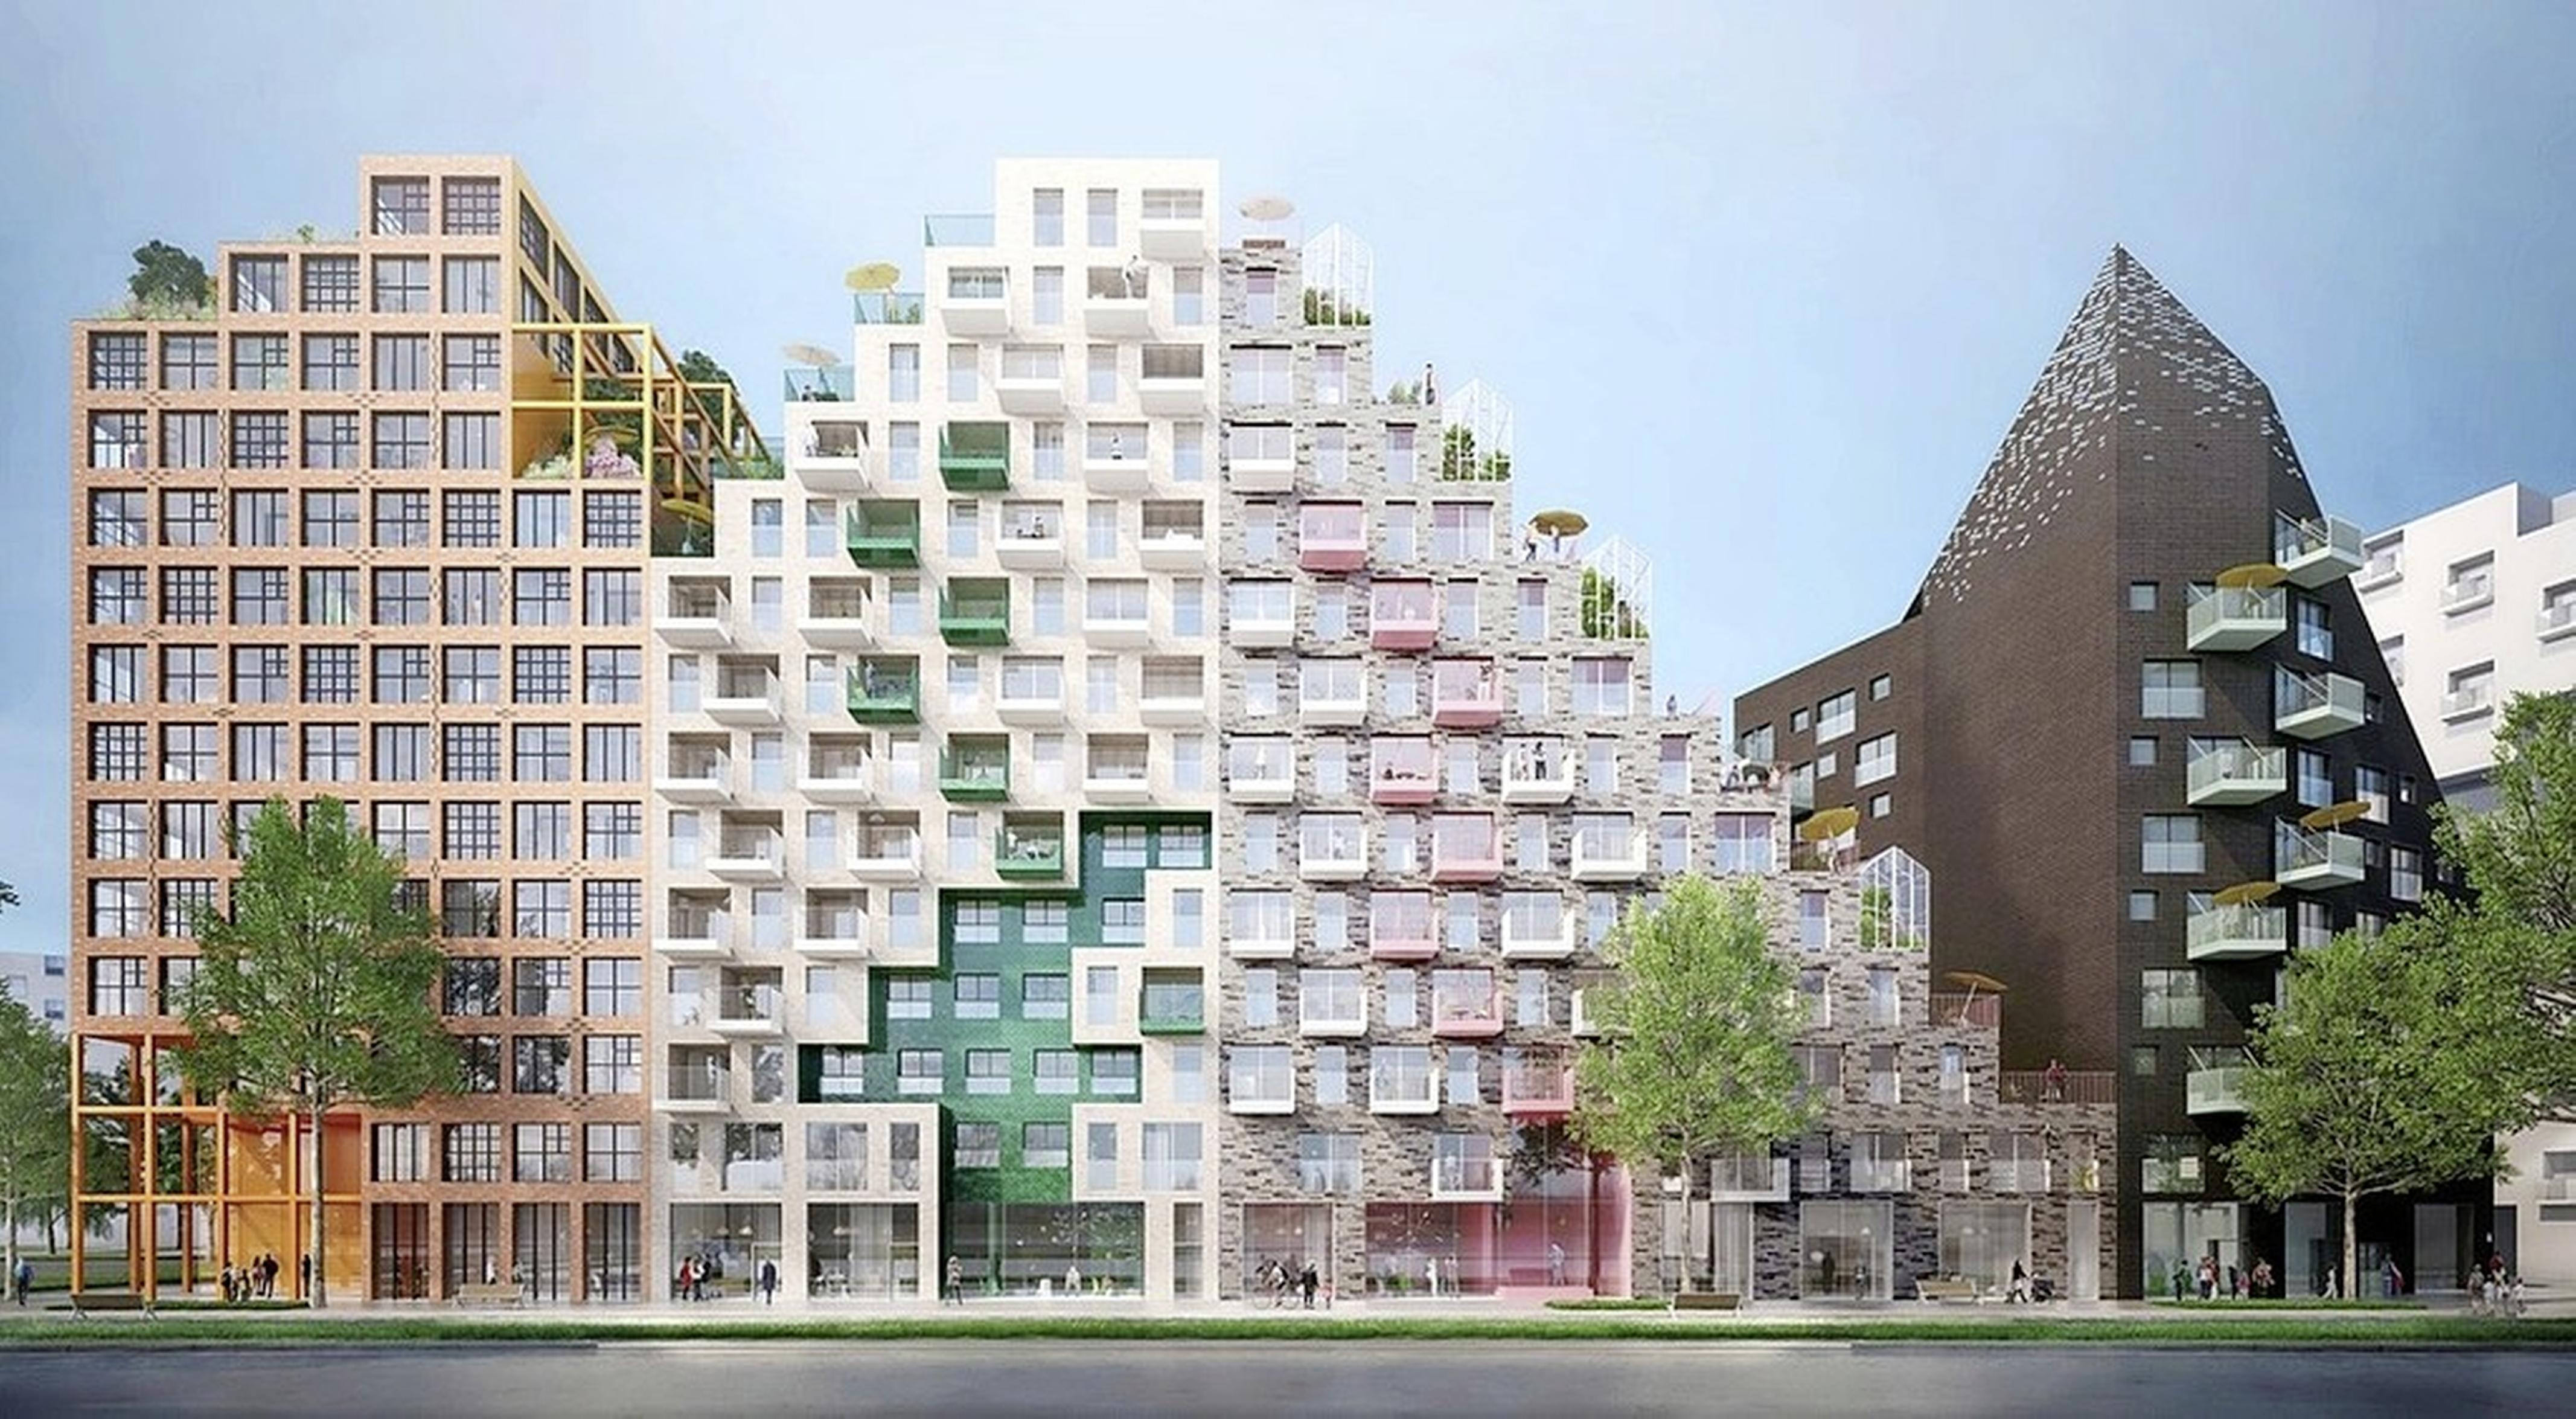 'Op die verdieping, bij dat raam woon ik.' Hyde Park in Hoofddorp wordt stads, maar ook herkenbaar